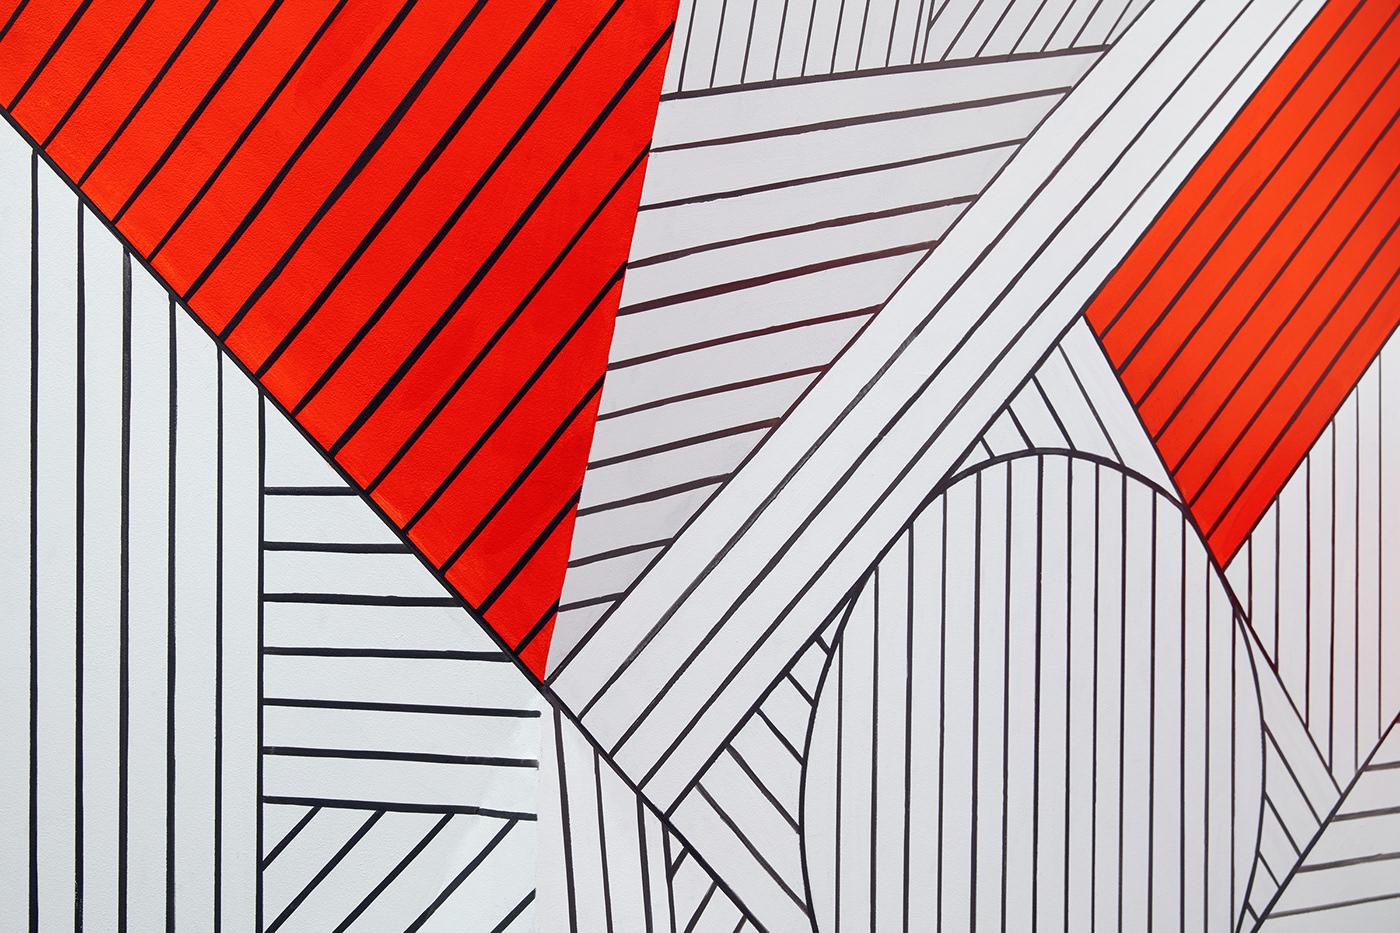 Mural SuperGraphics pattern asian environmental graphics graphic design  graphics Mural Painting